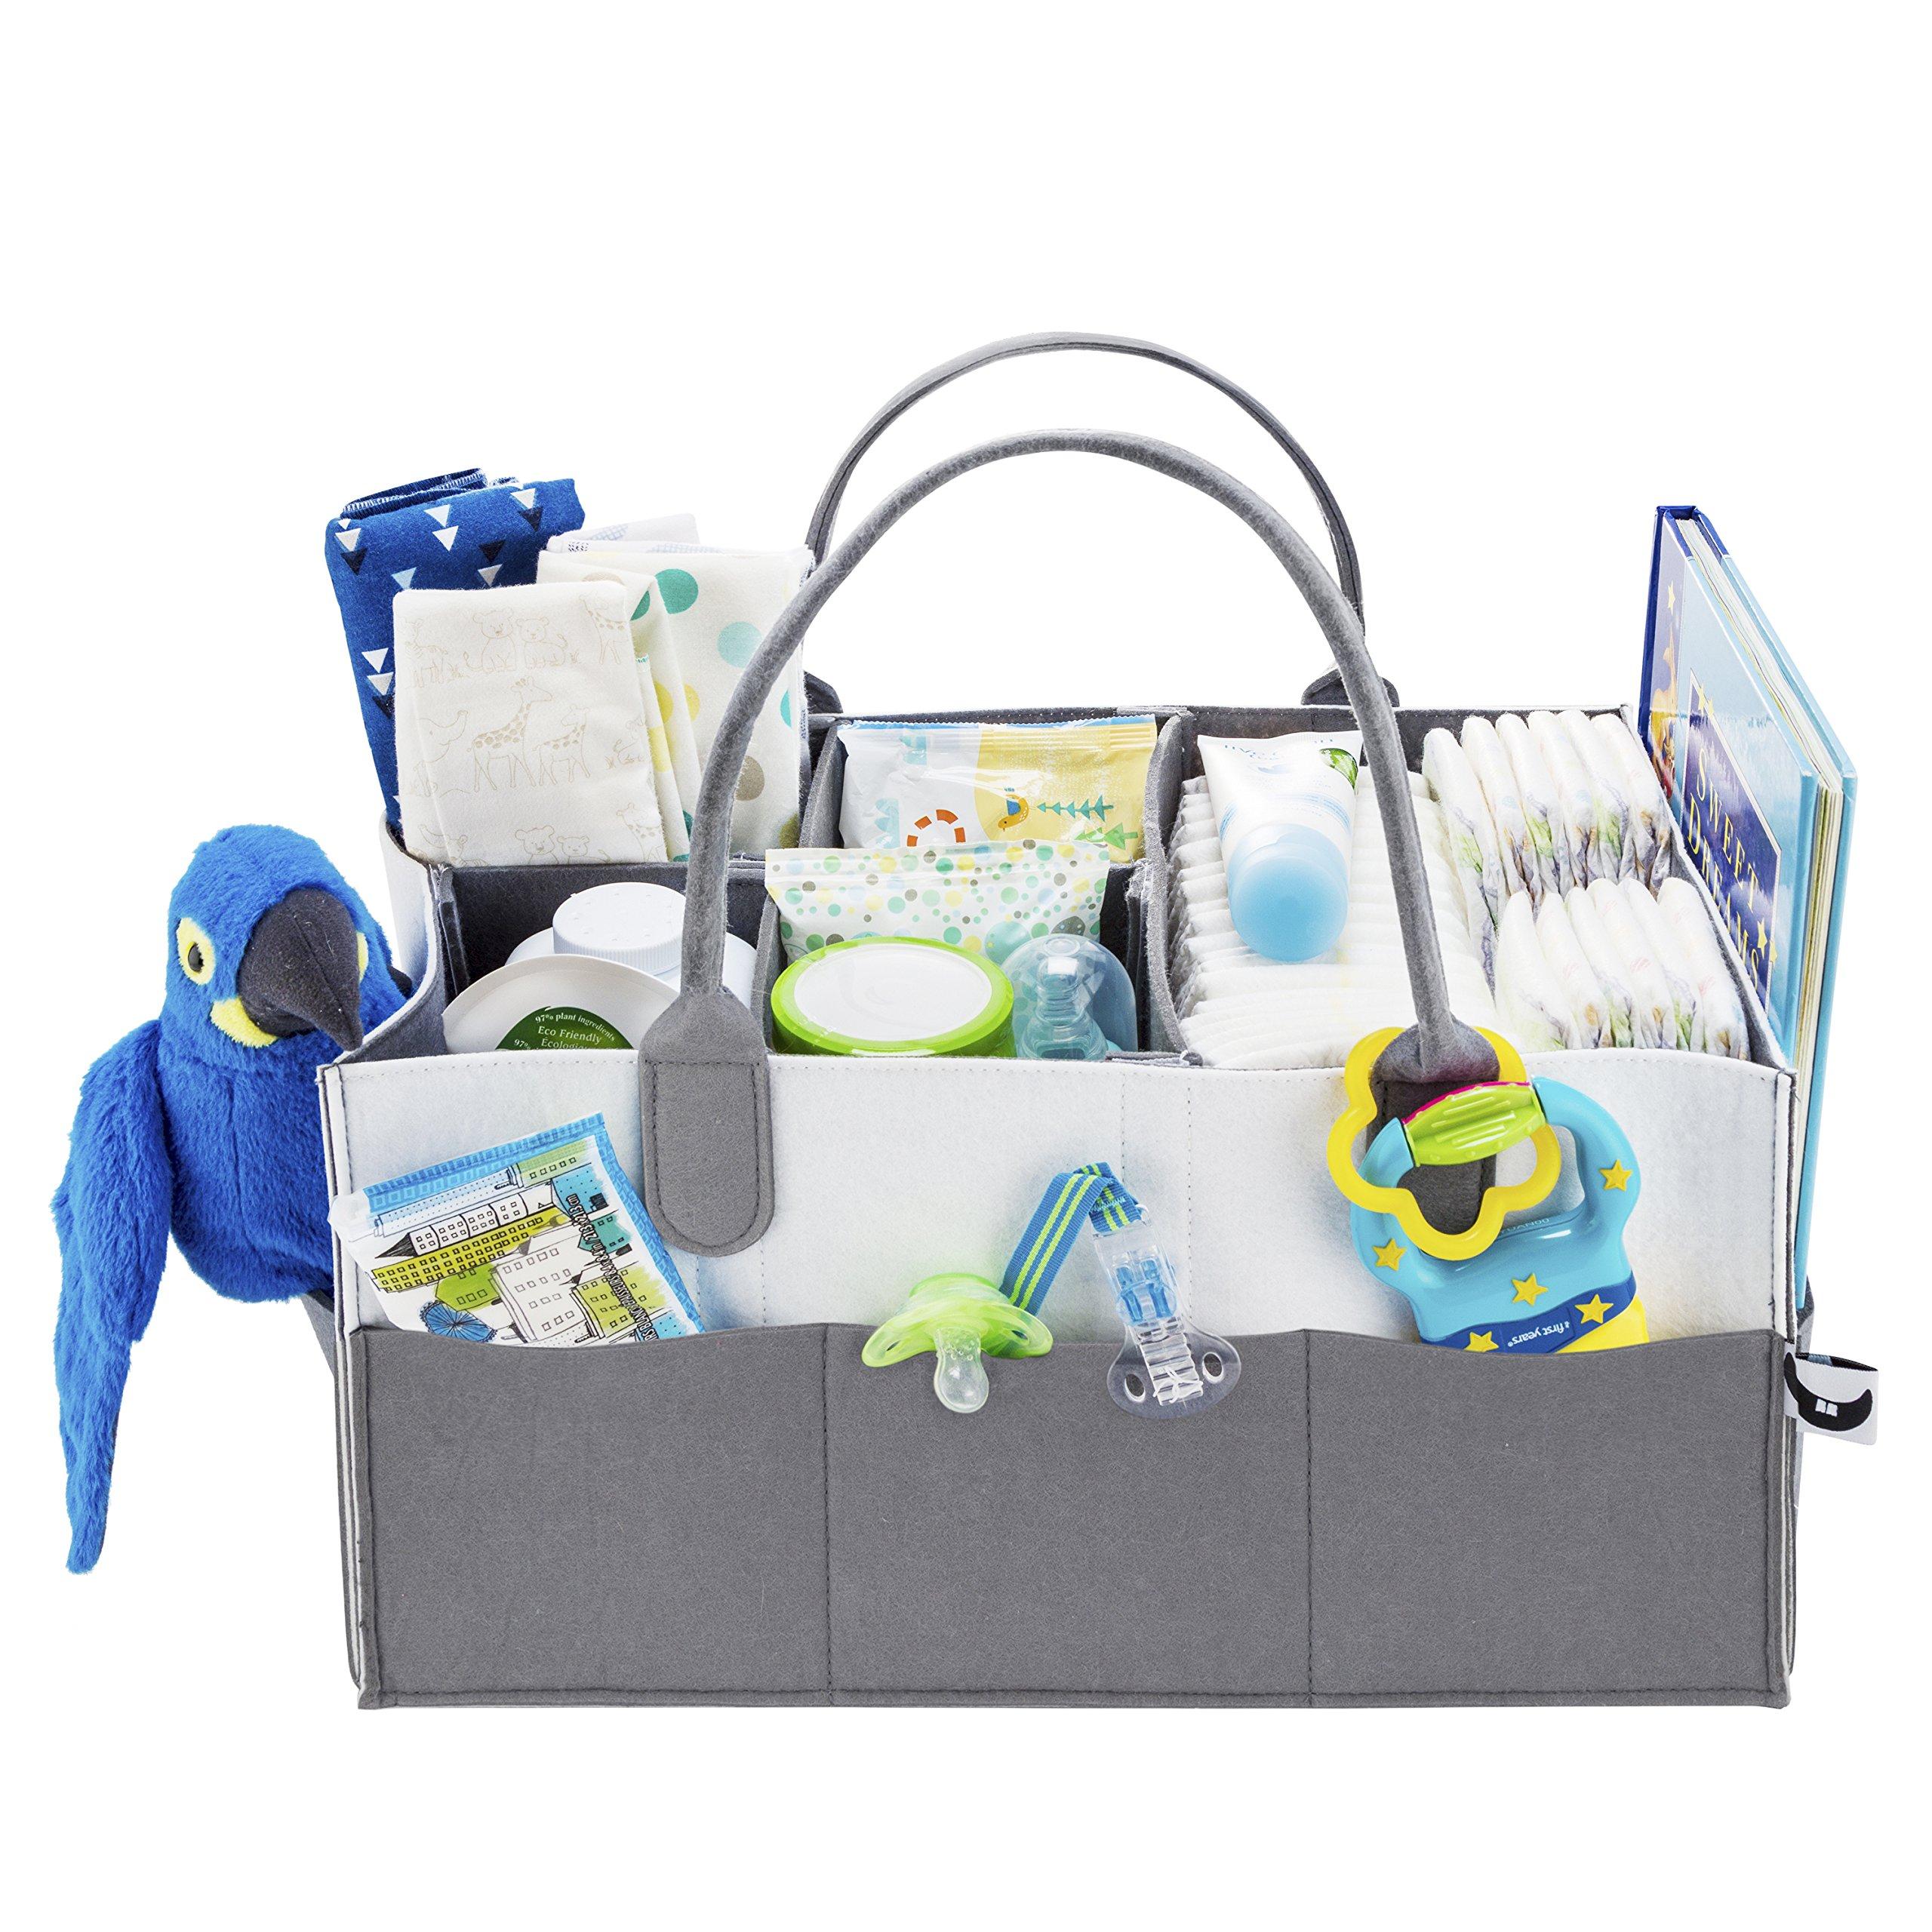 Nursery Diaper Caddy Organizer | Gift Registry for Baby Shower Must Haves | Large Baby Essentials Organizer | Cute Basket for Baby Gifts for Newborn Boys Girls Twins | Versatile Stylish Design 4 Moms